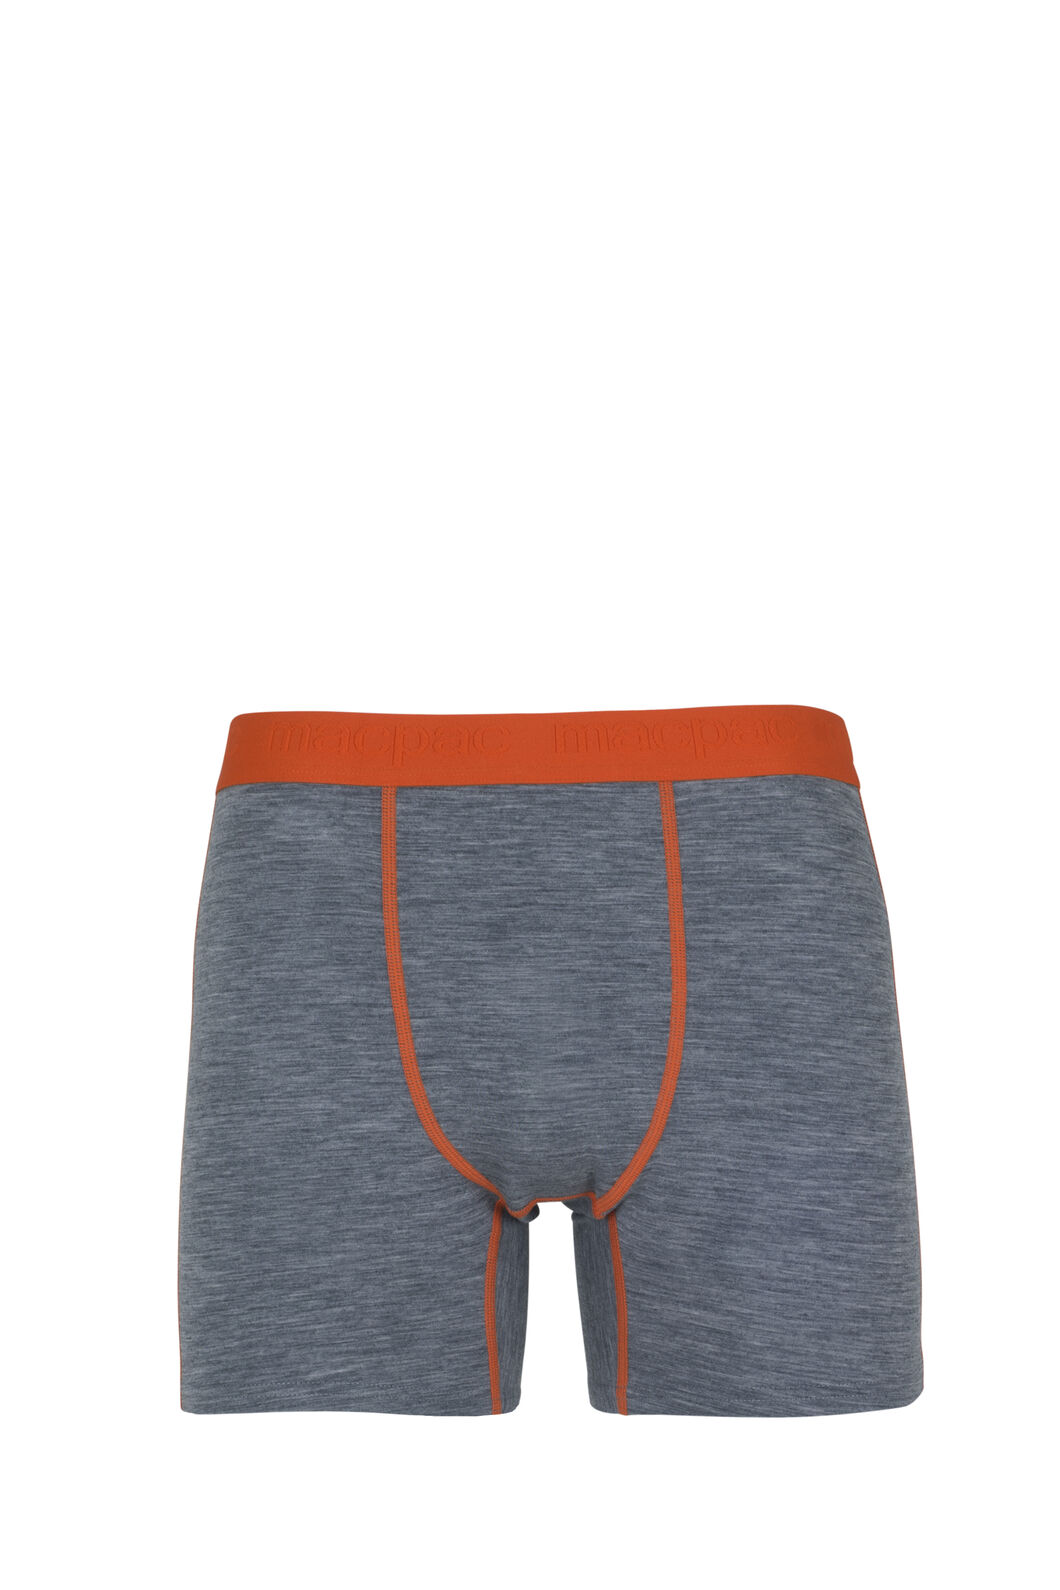 Macpac 180 Merino Boxers - Men's, Grey Malre/Puffins Bill, hi-res